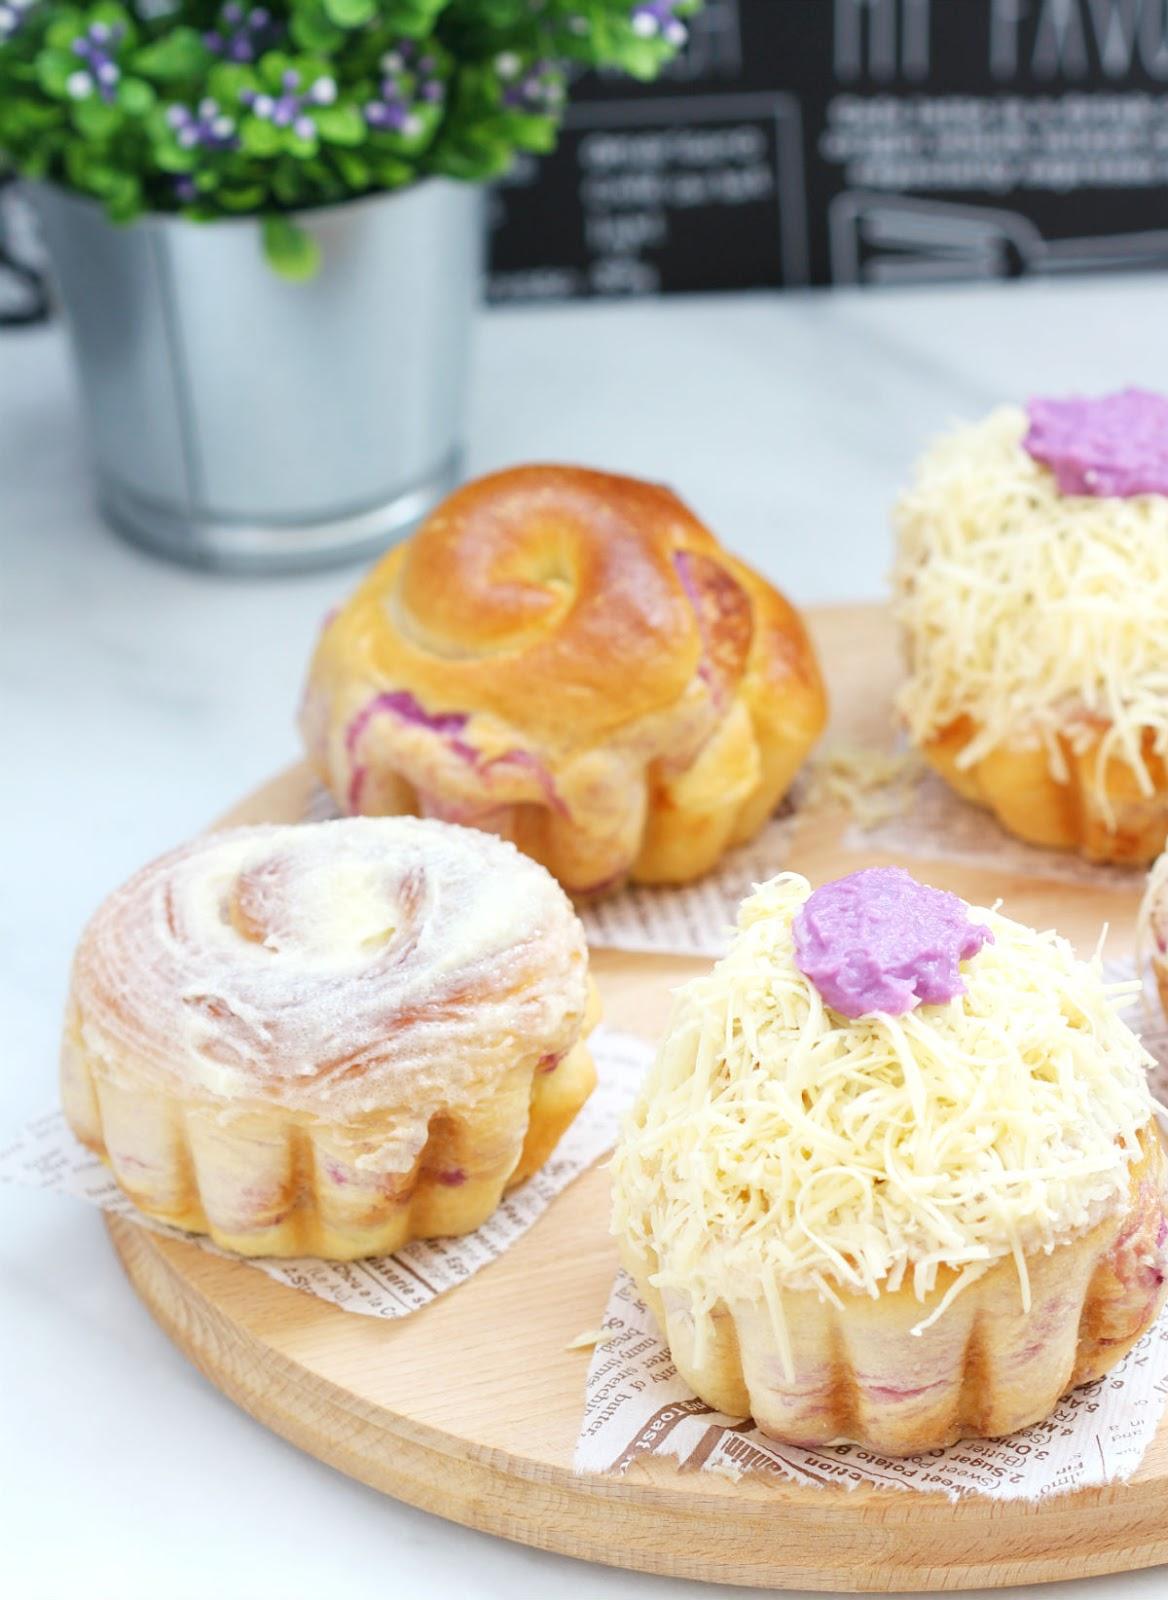 my bare cupboard: Ube ensaymada / Filipino-style bread rolls